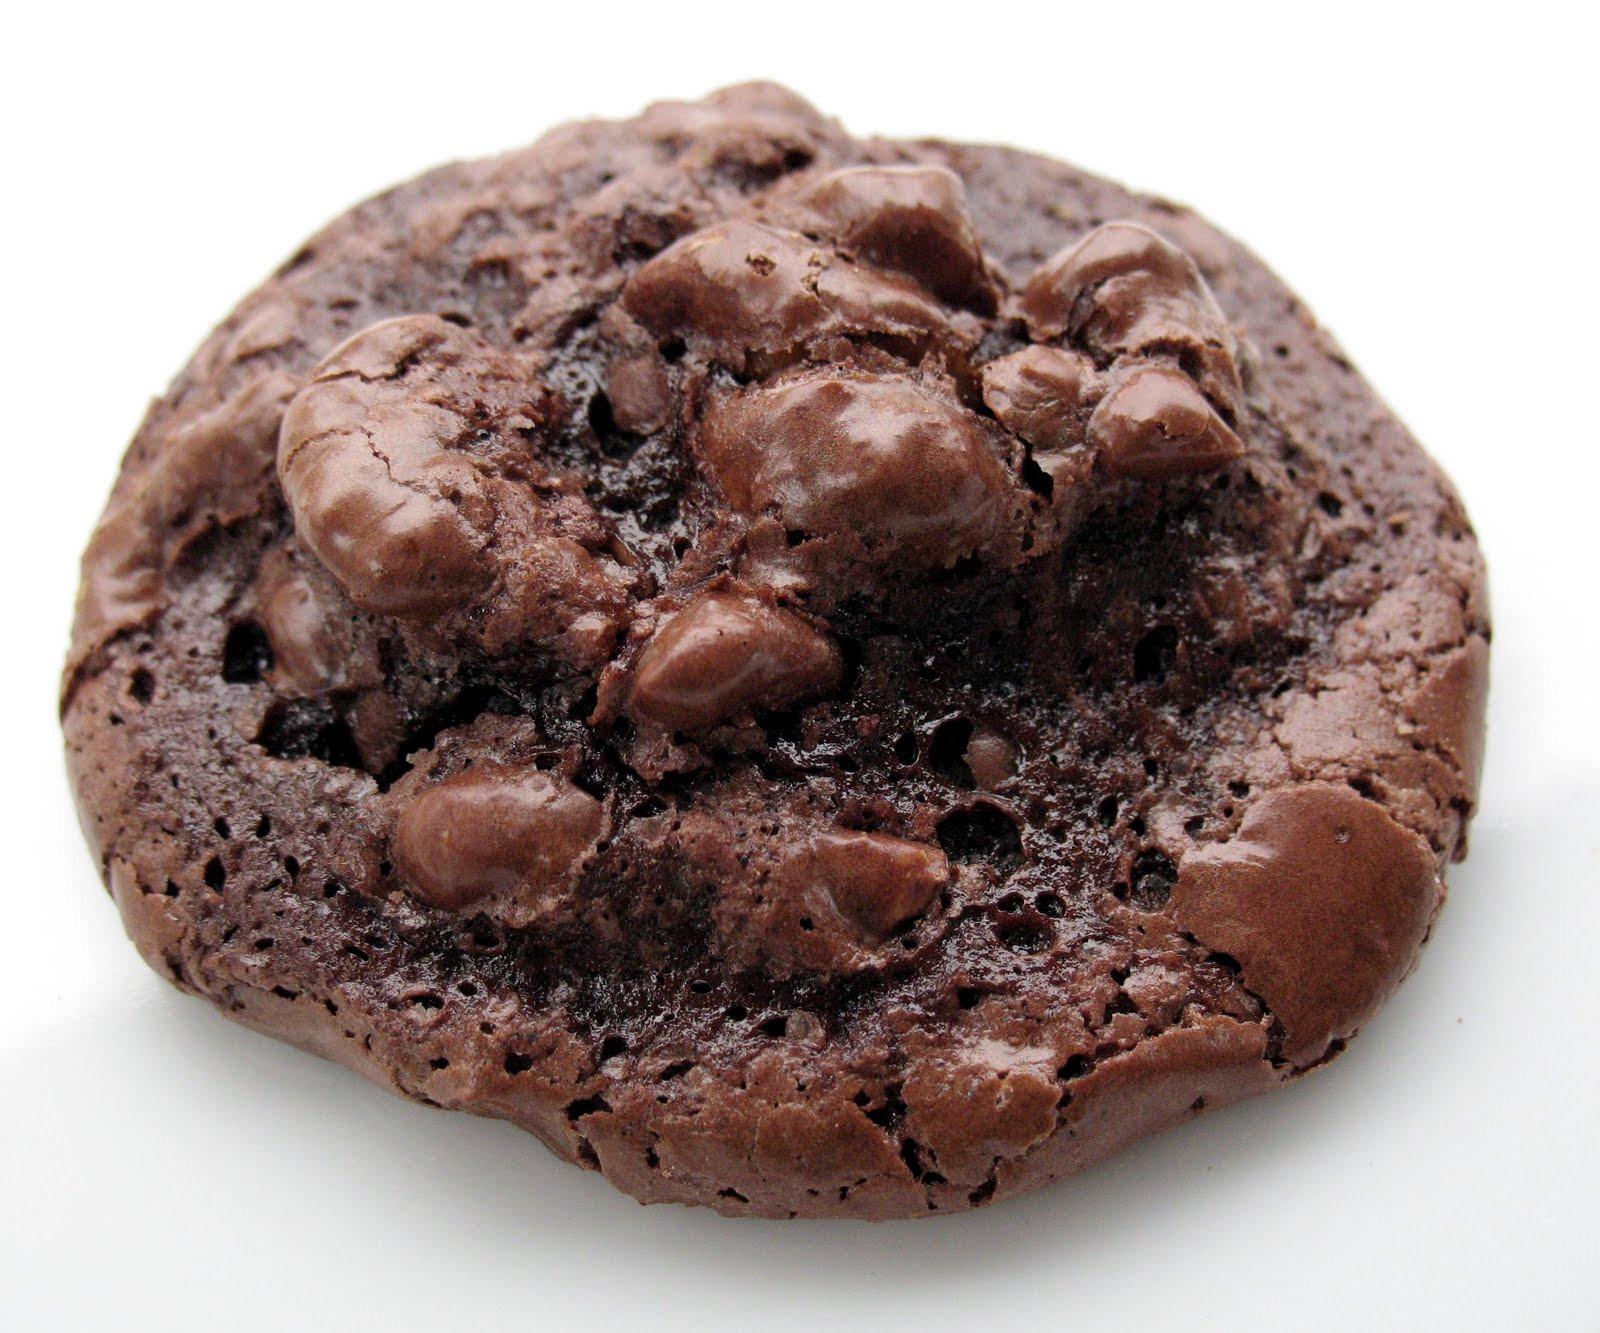 Chocolate Walnut Cookies  Flourless Chocolate Walnut Cookies Recipe